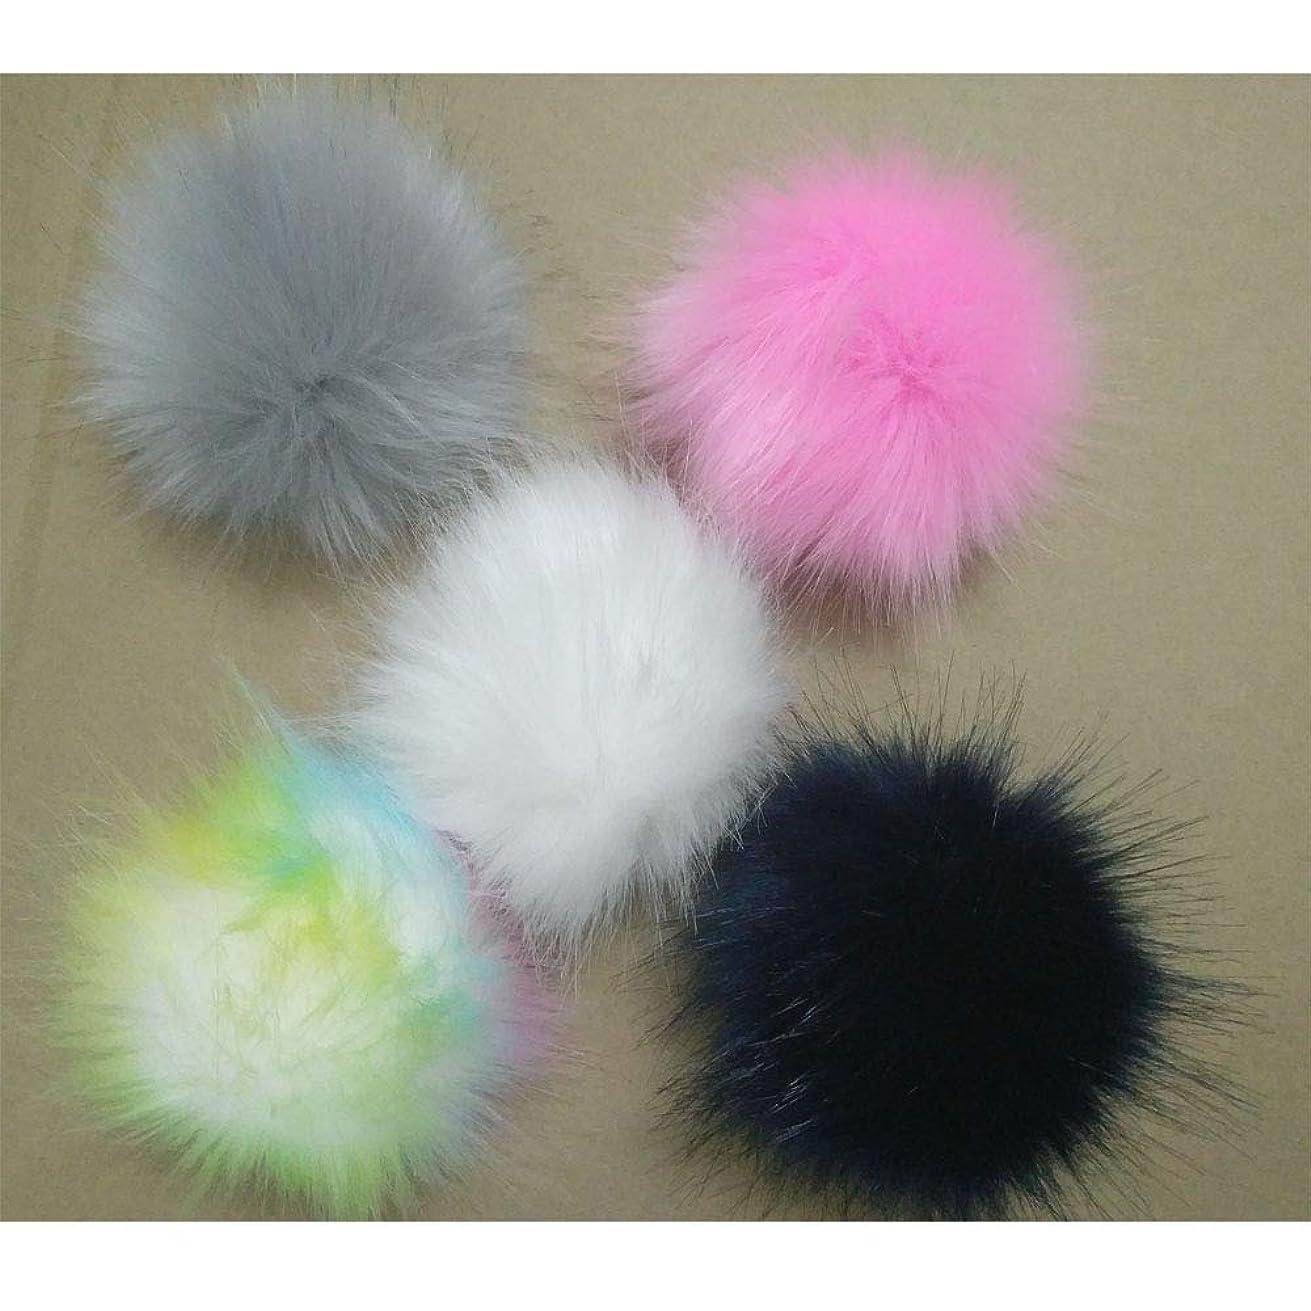 5pcs Faux Fur Pom Pom Balls for Hats Beanies Shoes Scarves Bag Charms